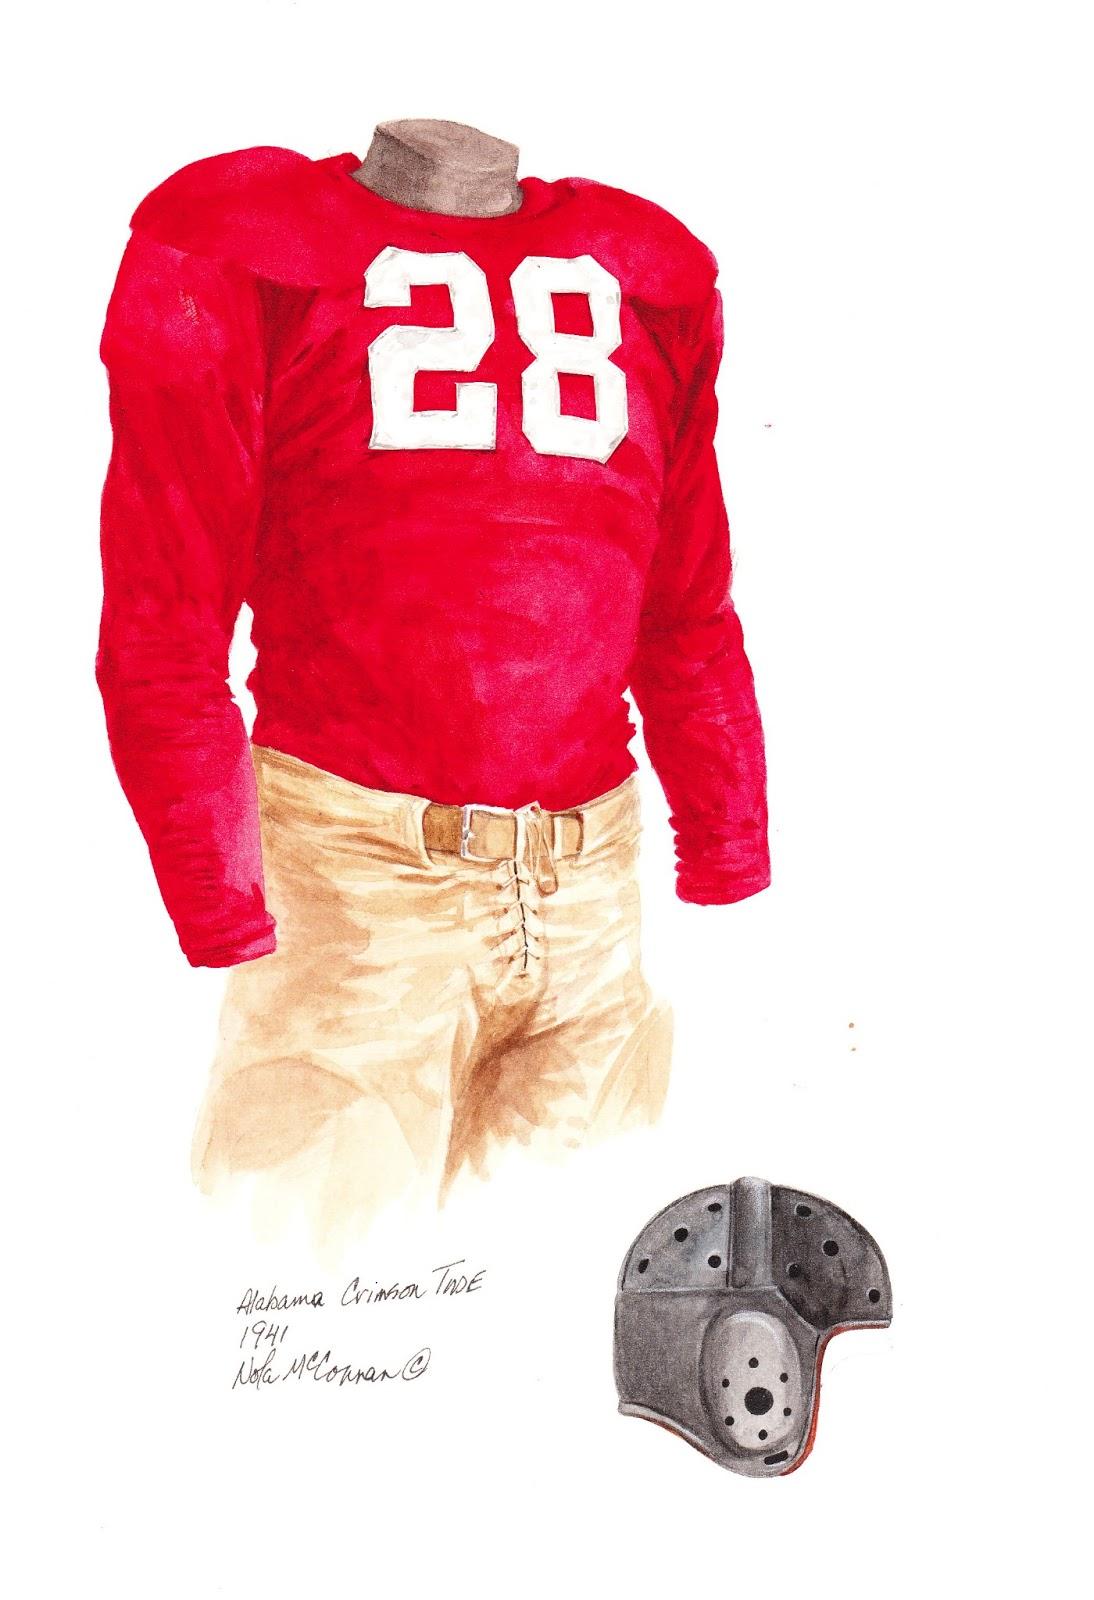 8b5f5b8ba 1941 Alabama Crimson Tide football uniform original art for sale